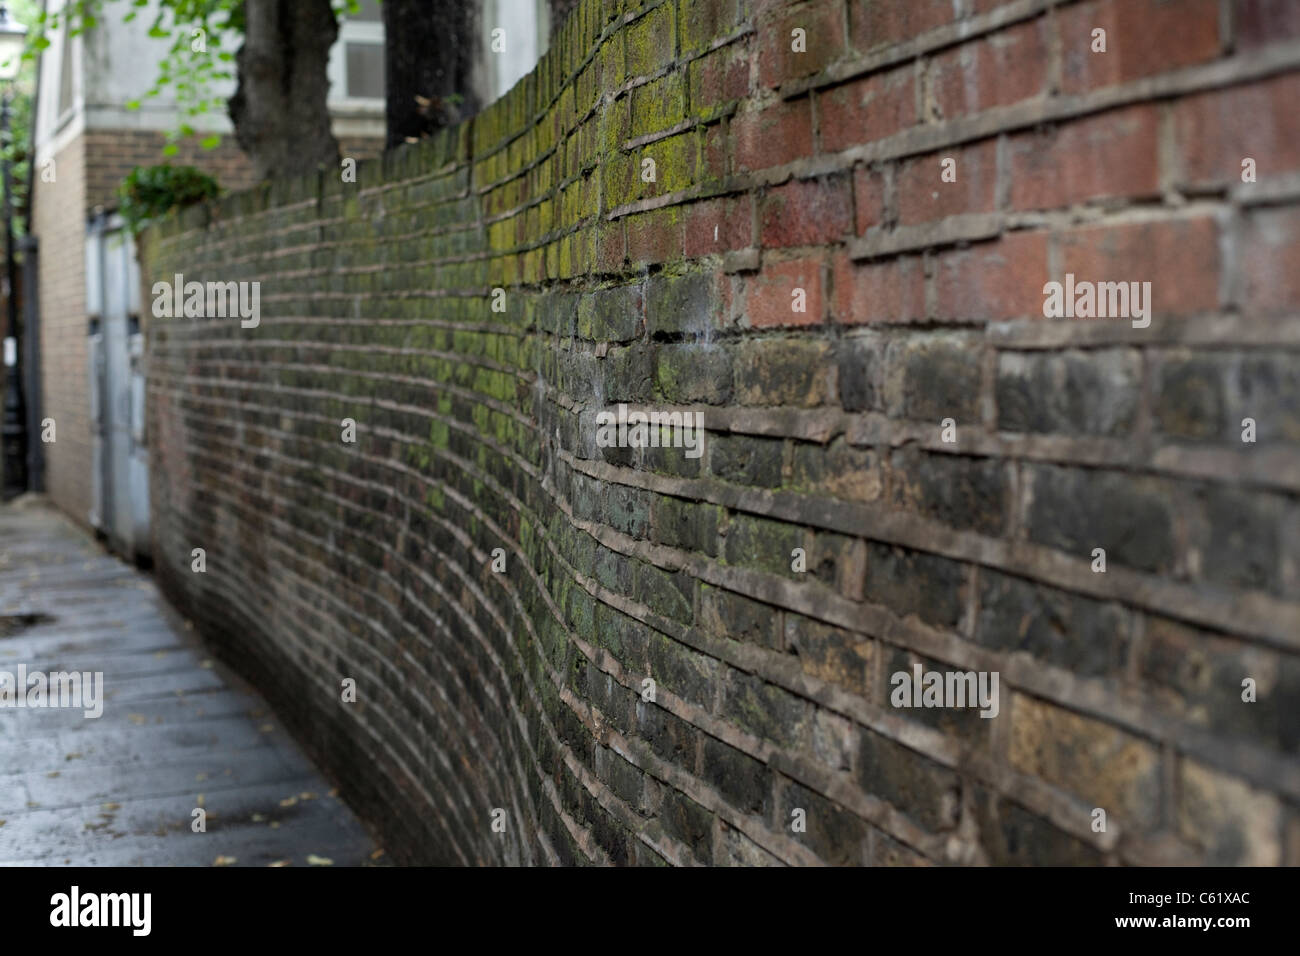 Crooked brick wall, London, England, UK. - Stock Image